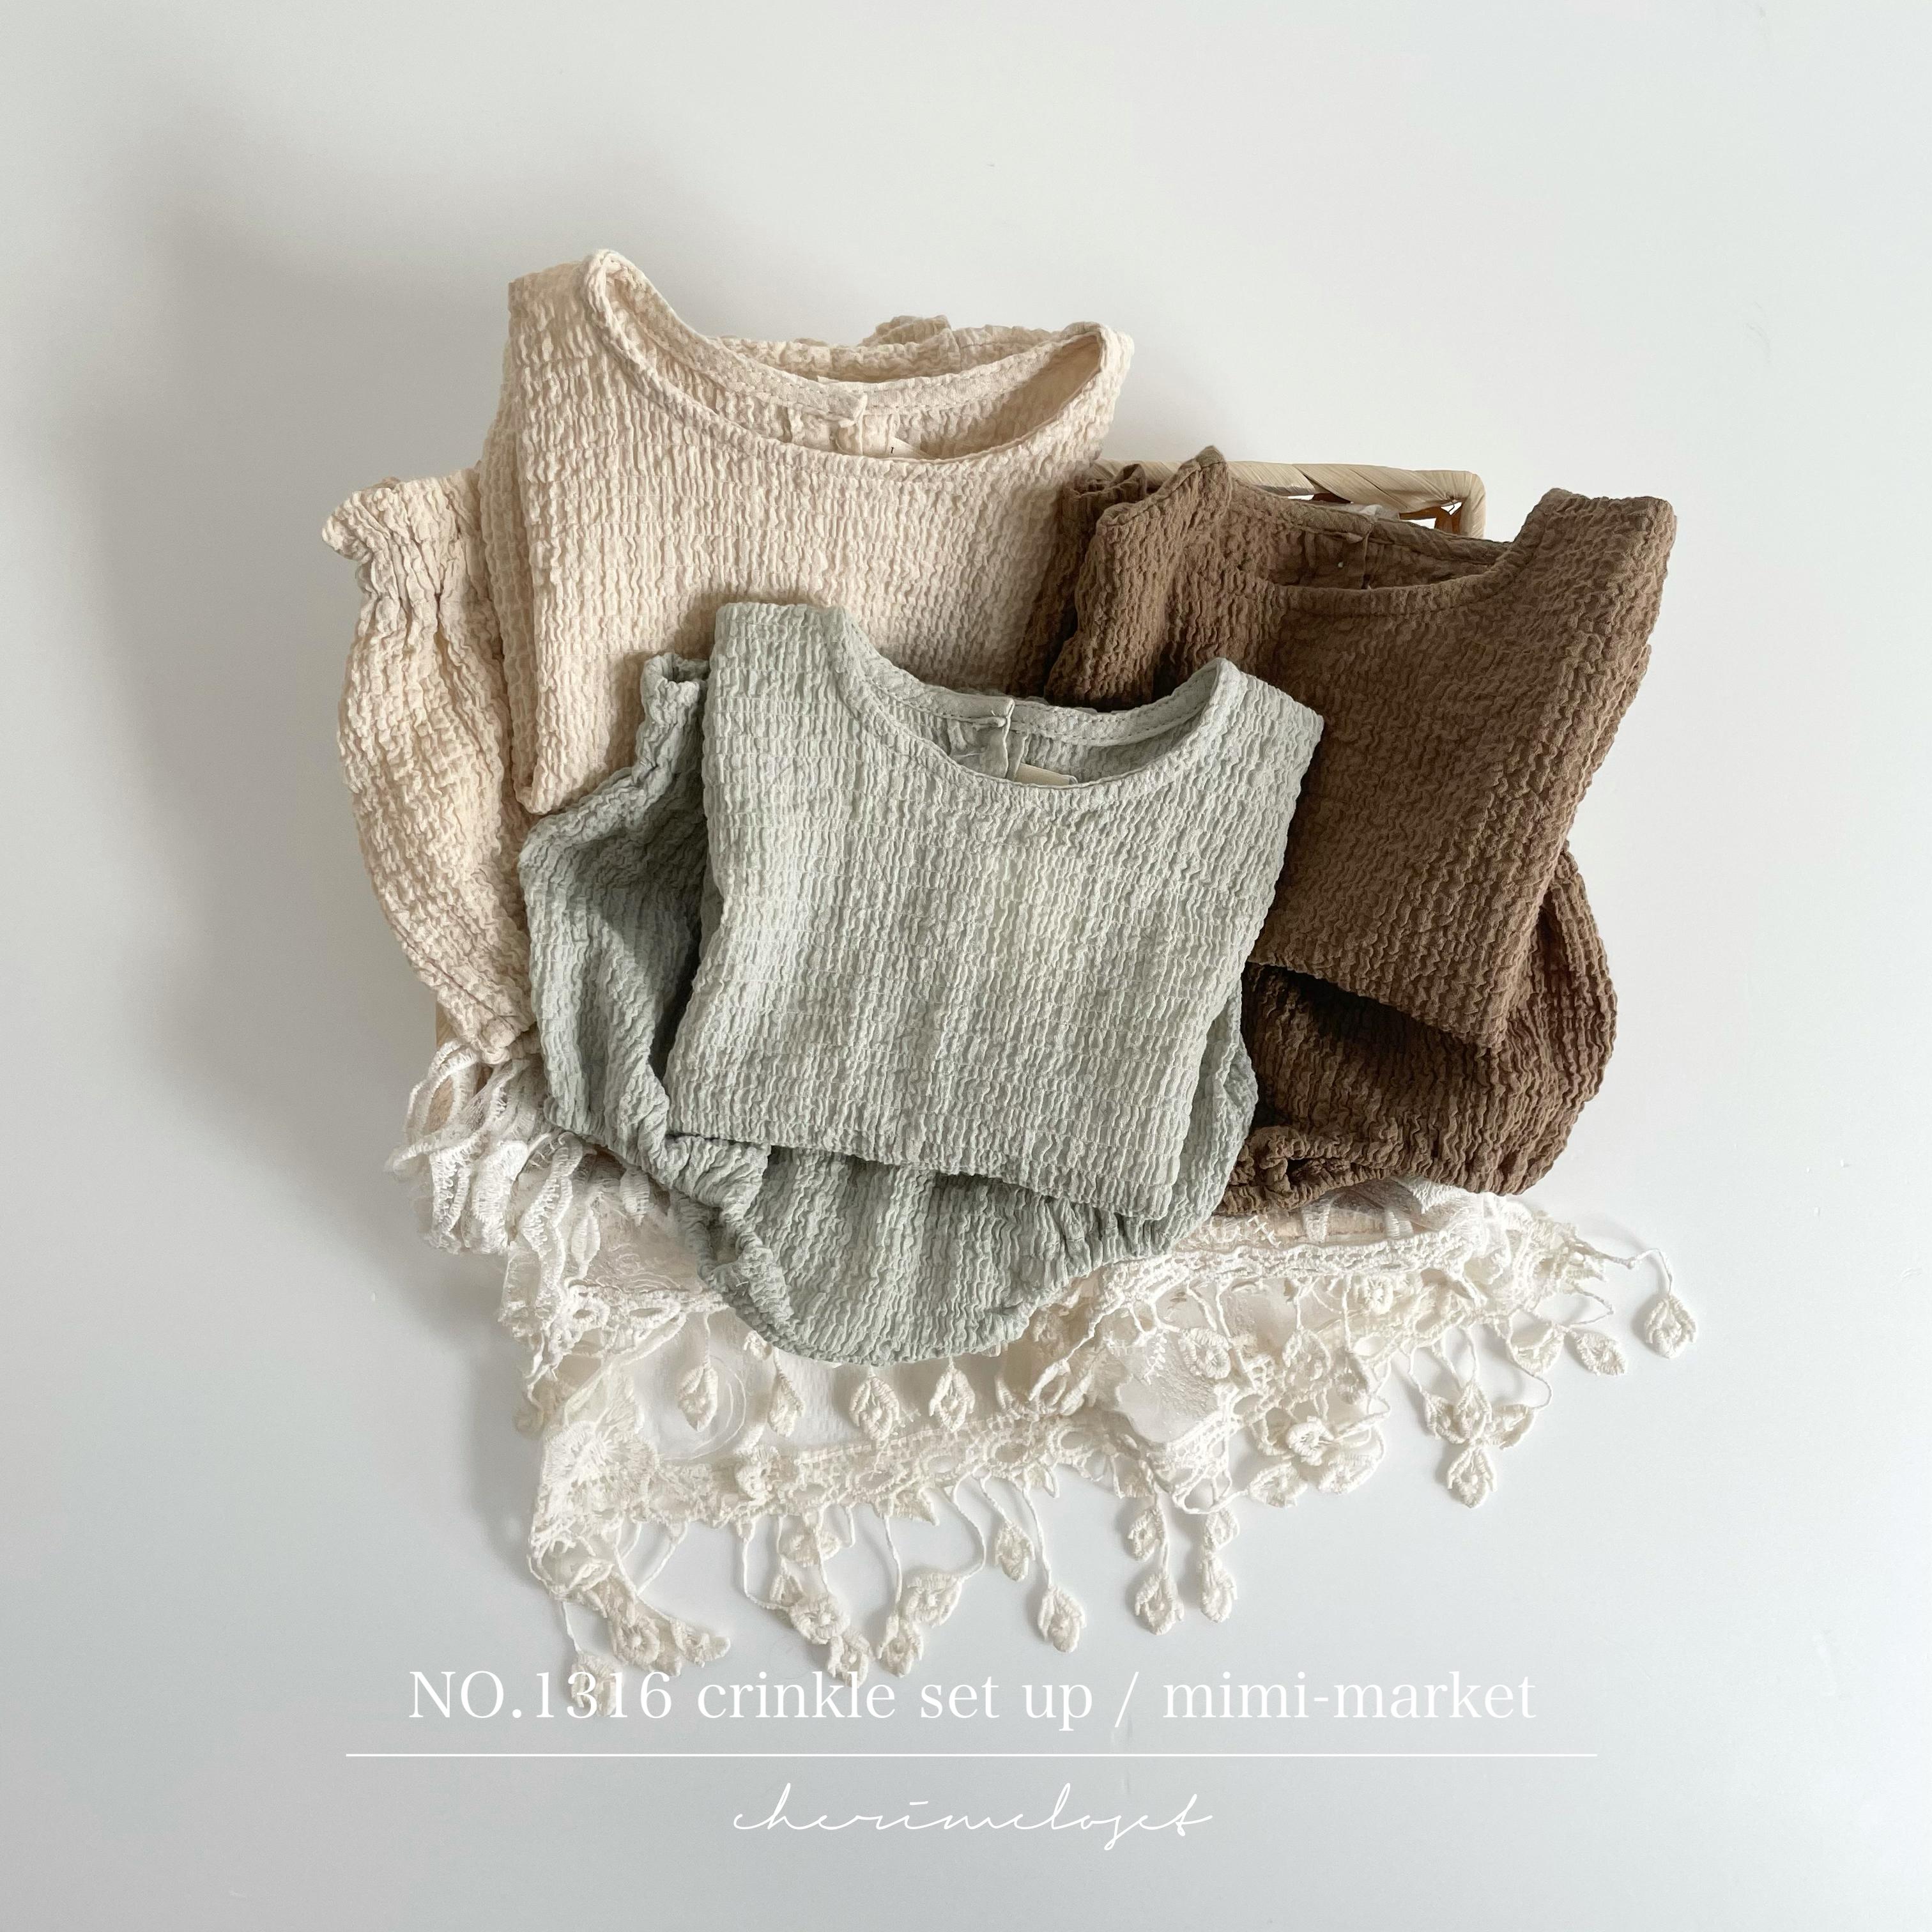 NO.1316 Crinkle setup / mimi - market